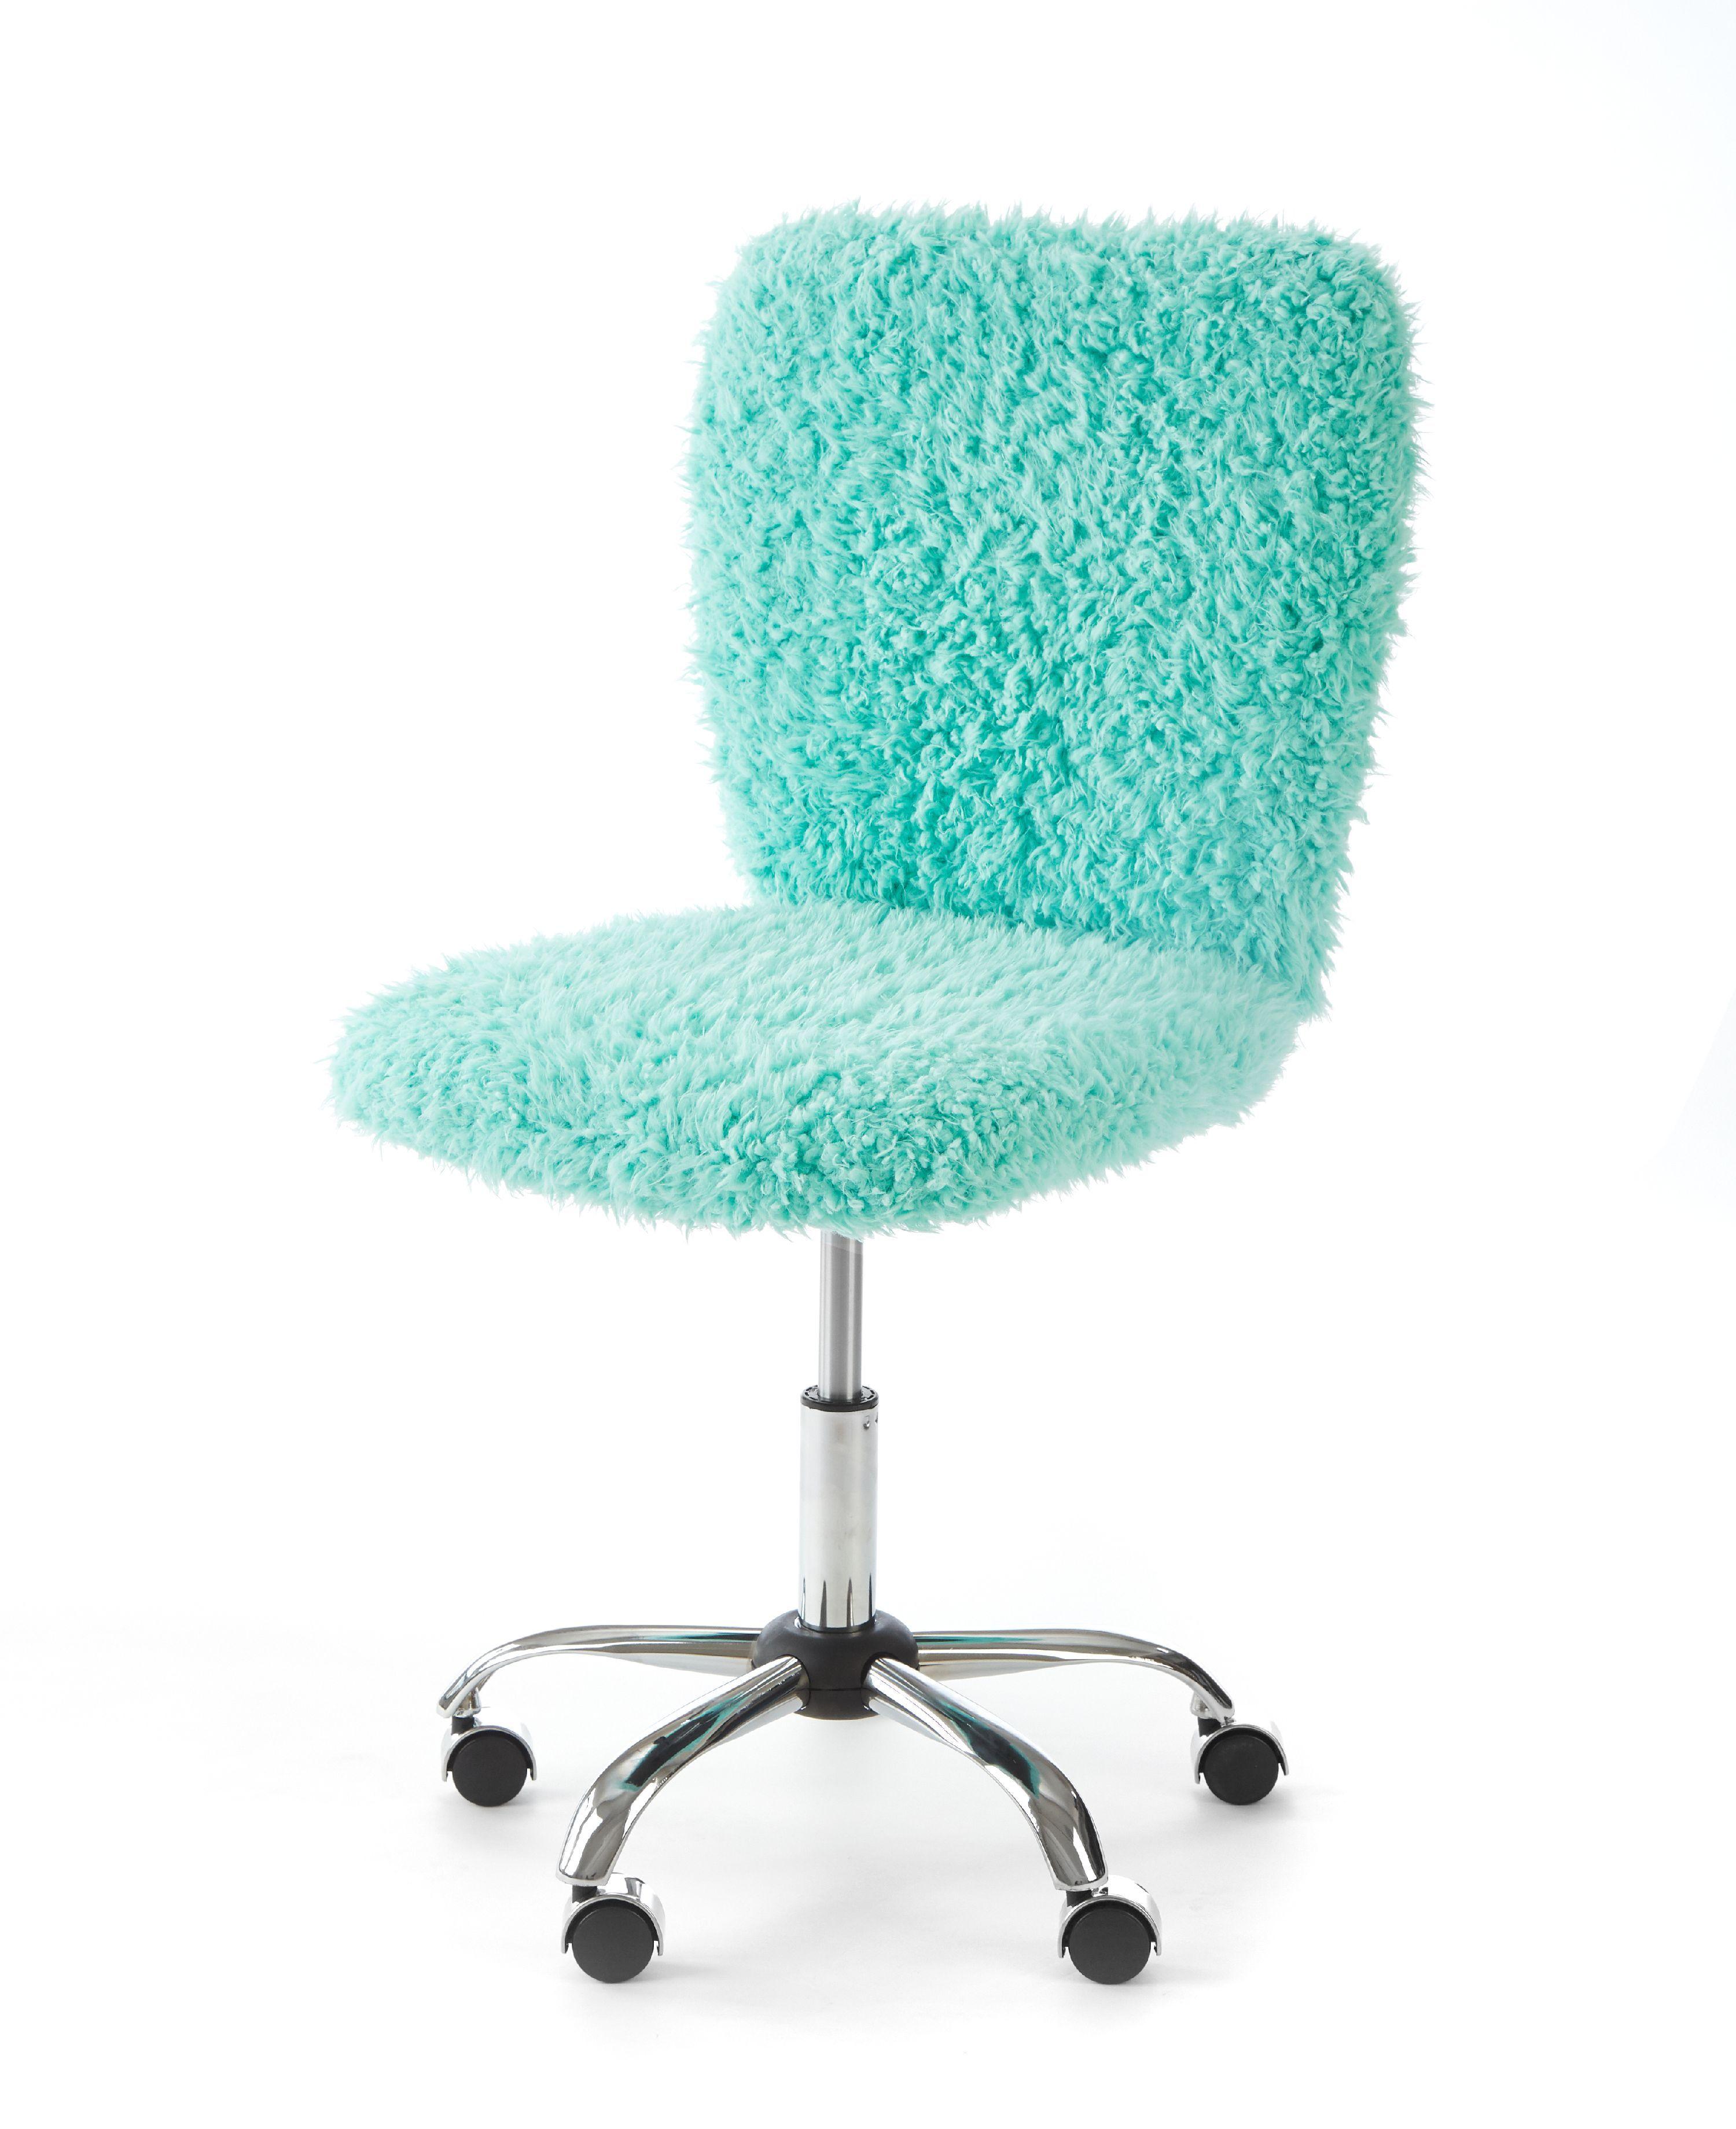 Urban Shop Faux Fur Armless Swivel Task Office Chair Multiple Colors Walmart Com In 2020 Office Chair Urban Shop Task Chair